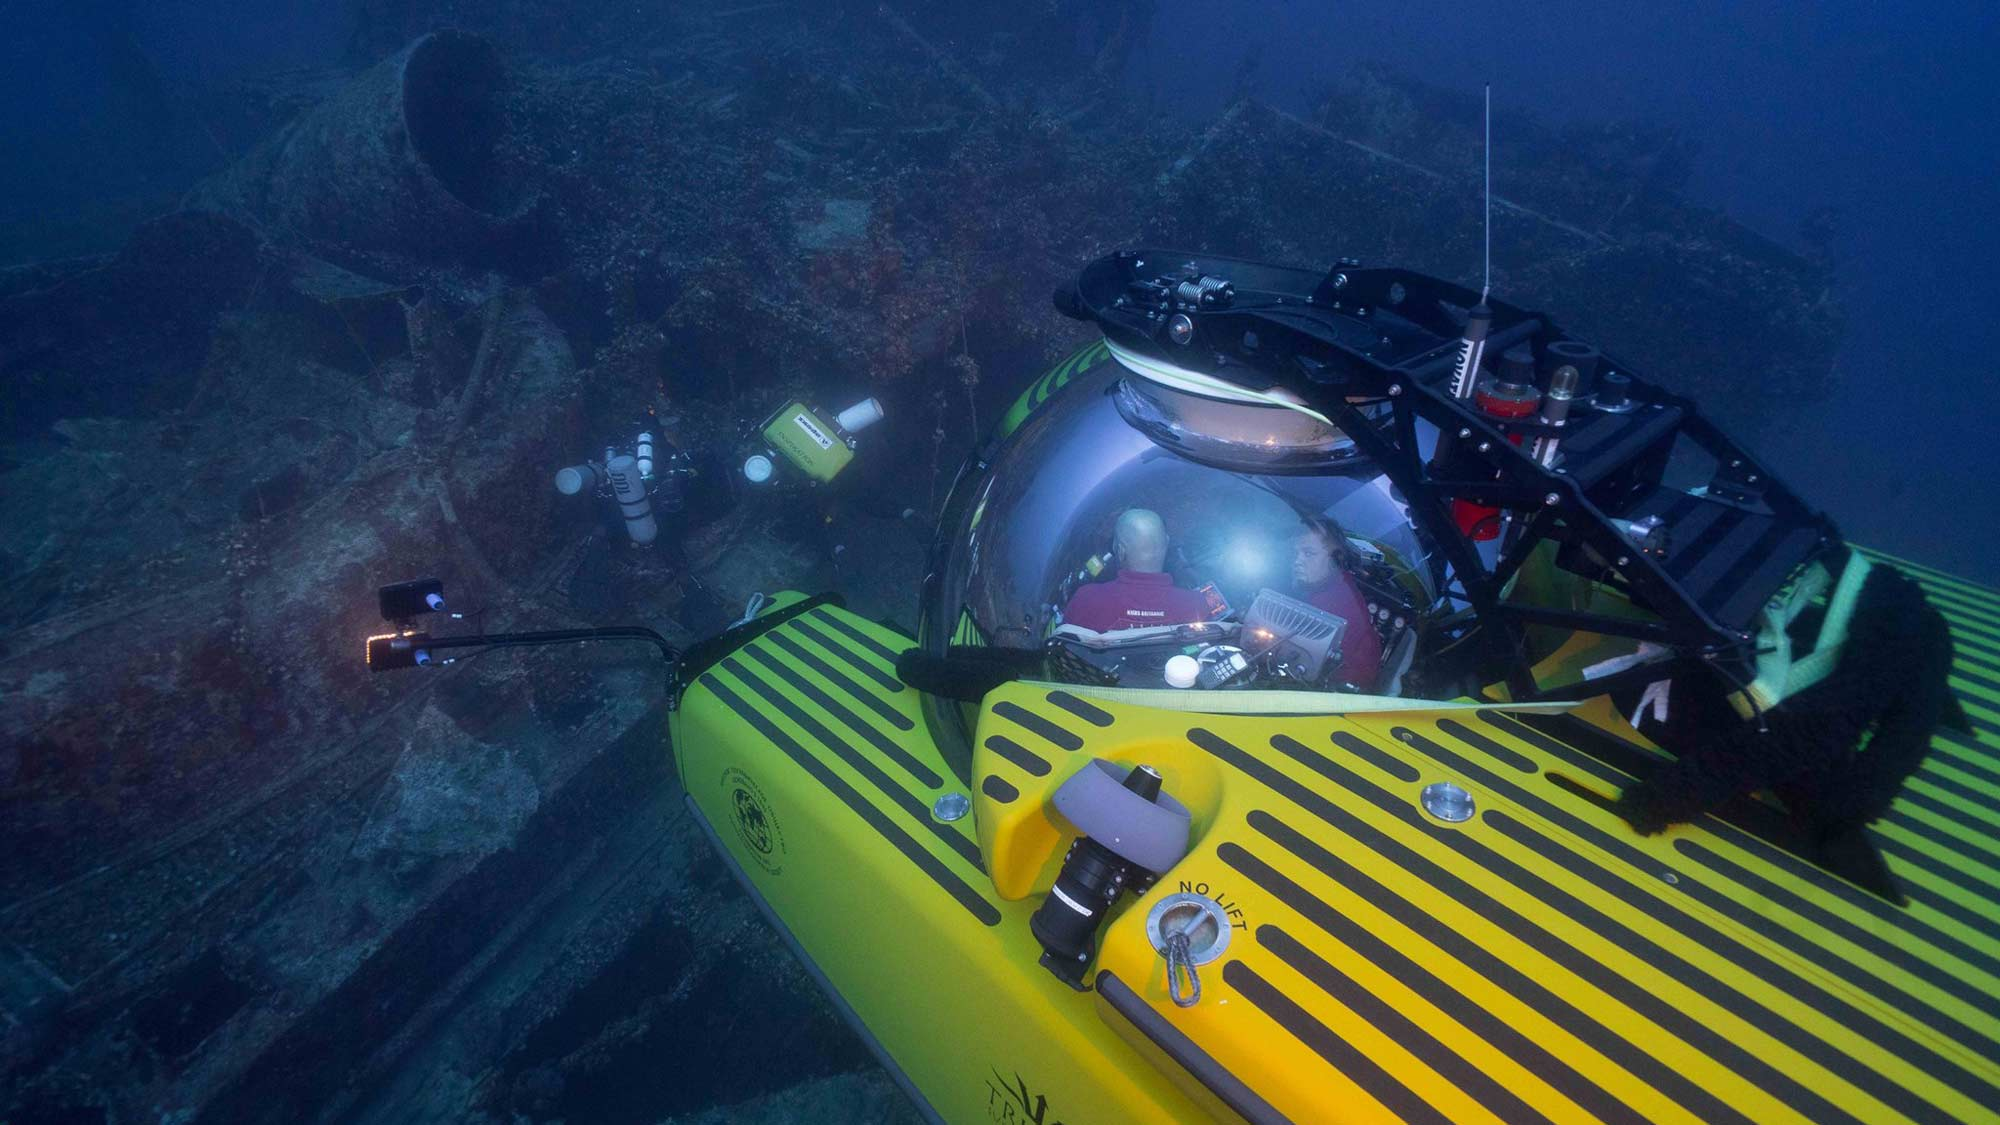 Triton 3300/3 films a wreck site